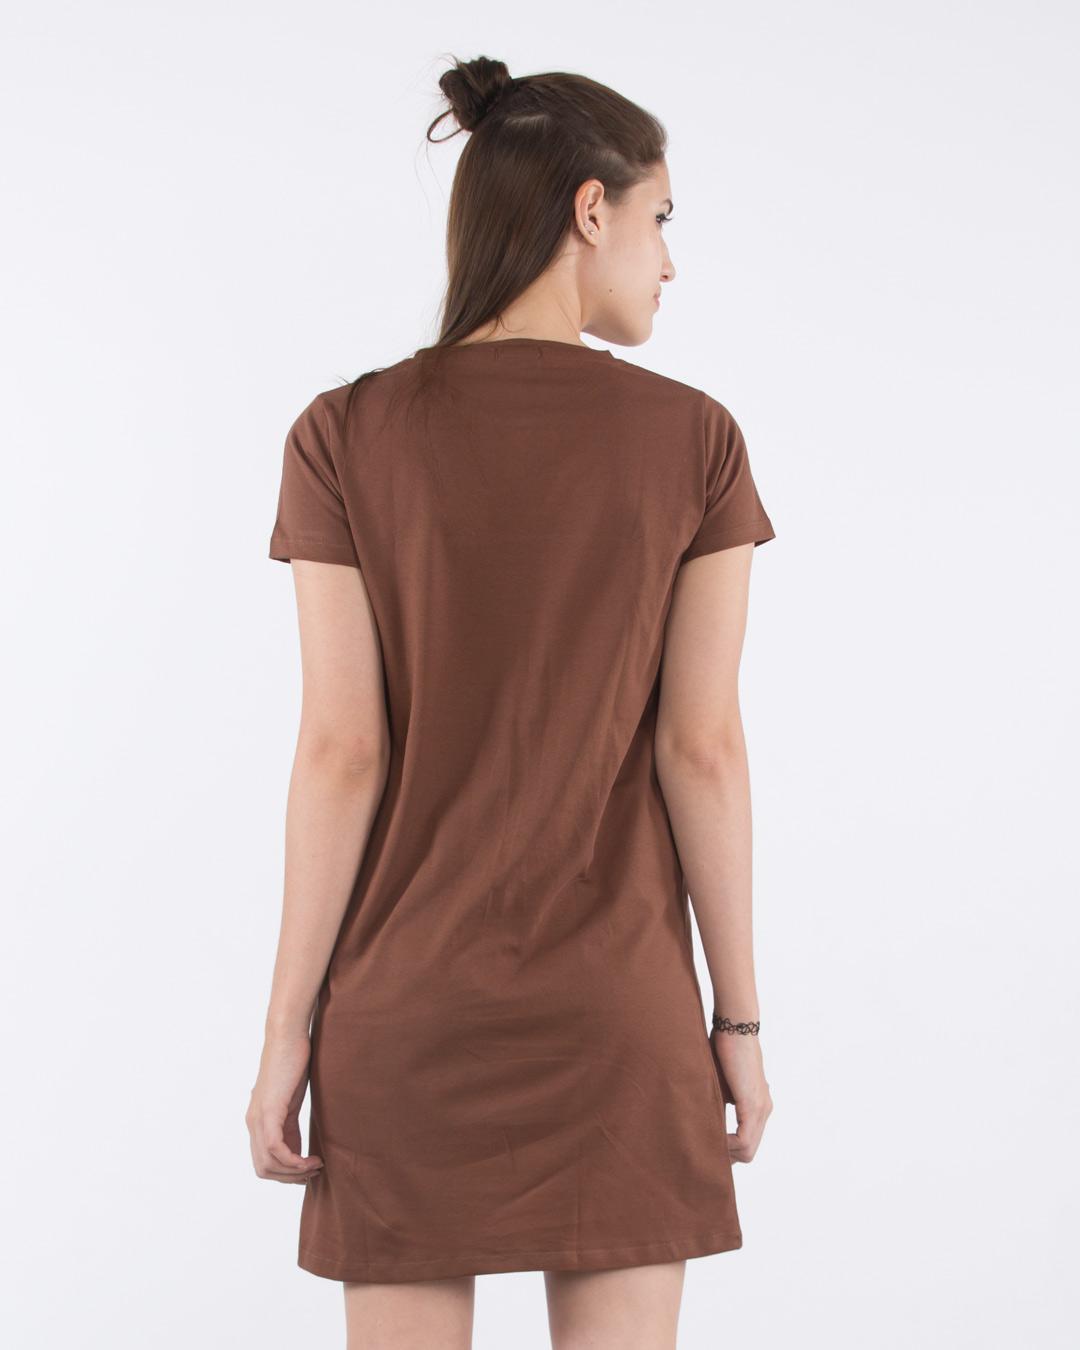 acce25a6ff22 Mocha Brown Basic T-Shirt Dress - Plain Womens Basic T-Shirt Dress ...